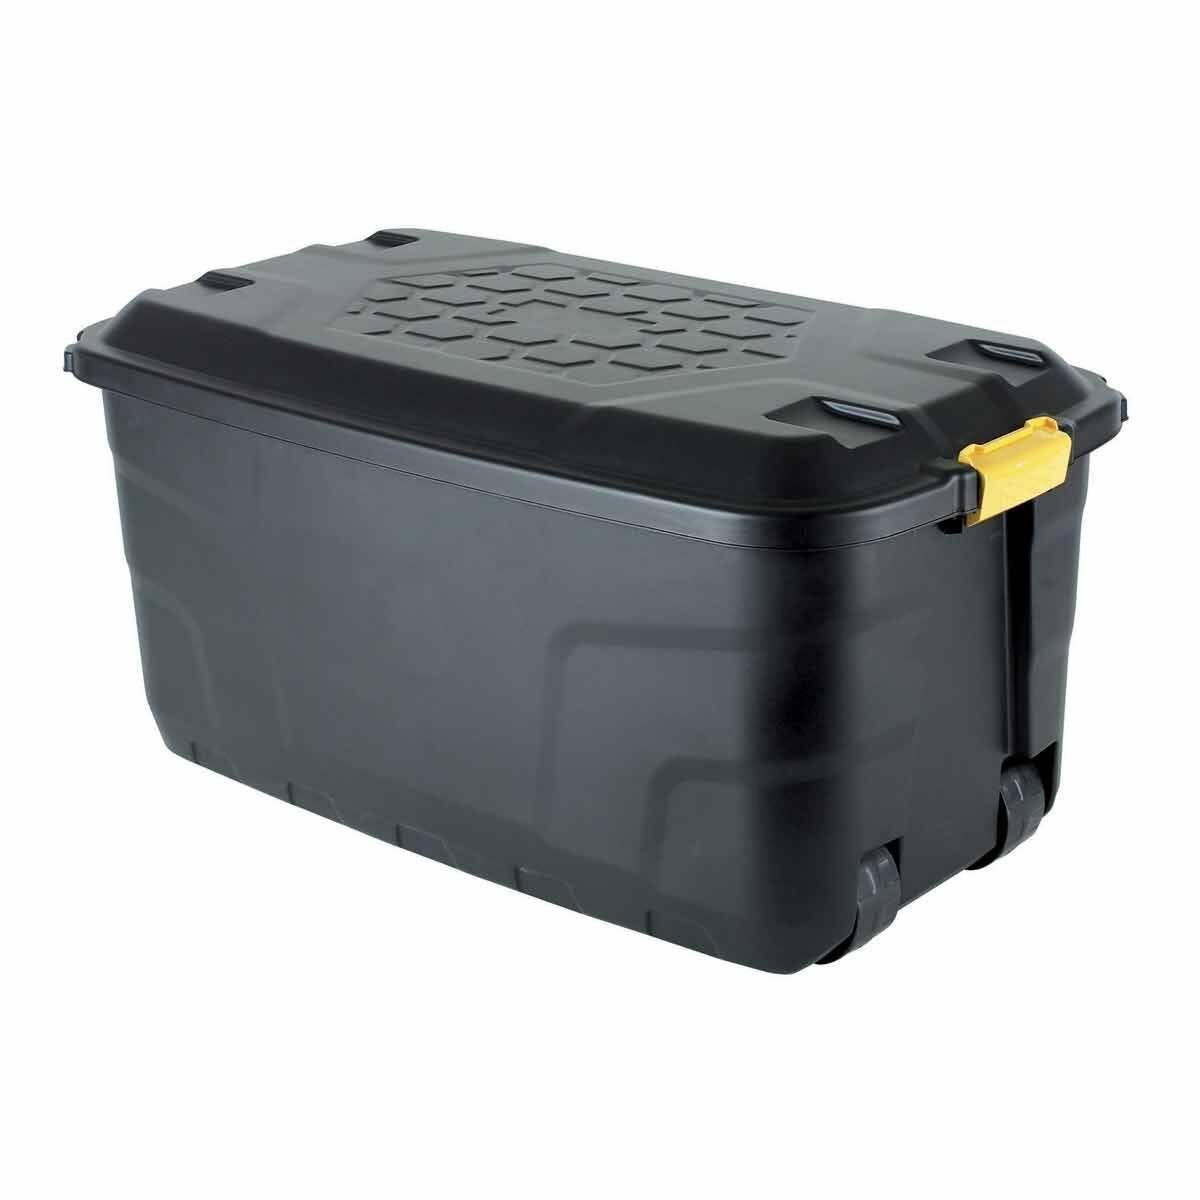 Strata Heavy Duty Storage Box with Wheels 145 Litre